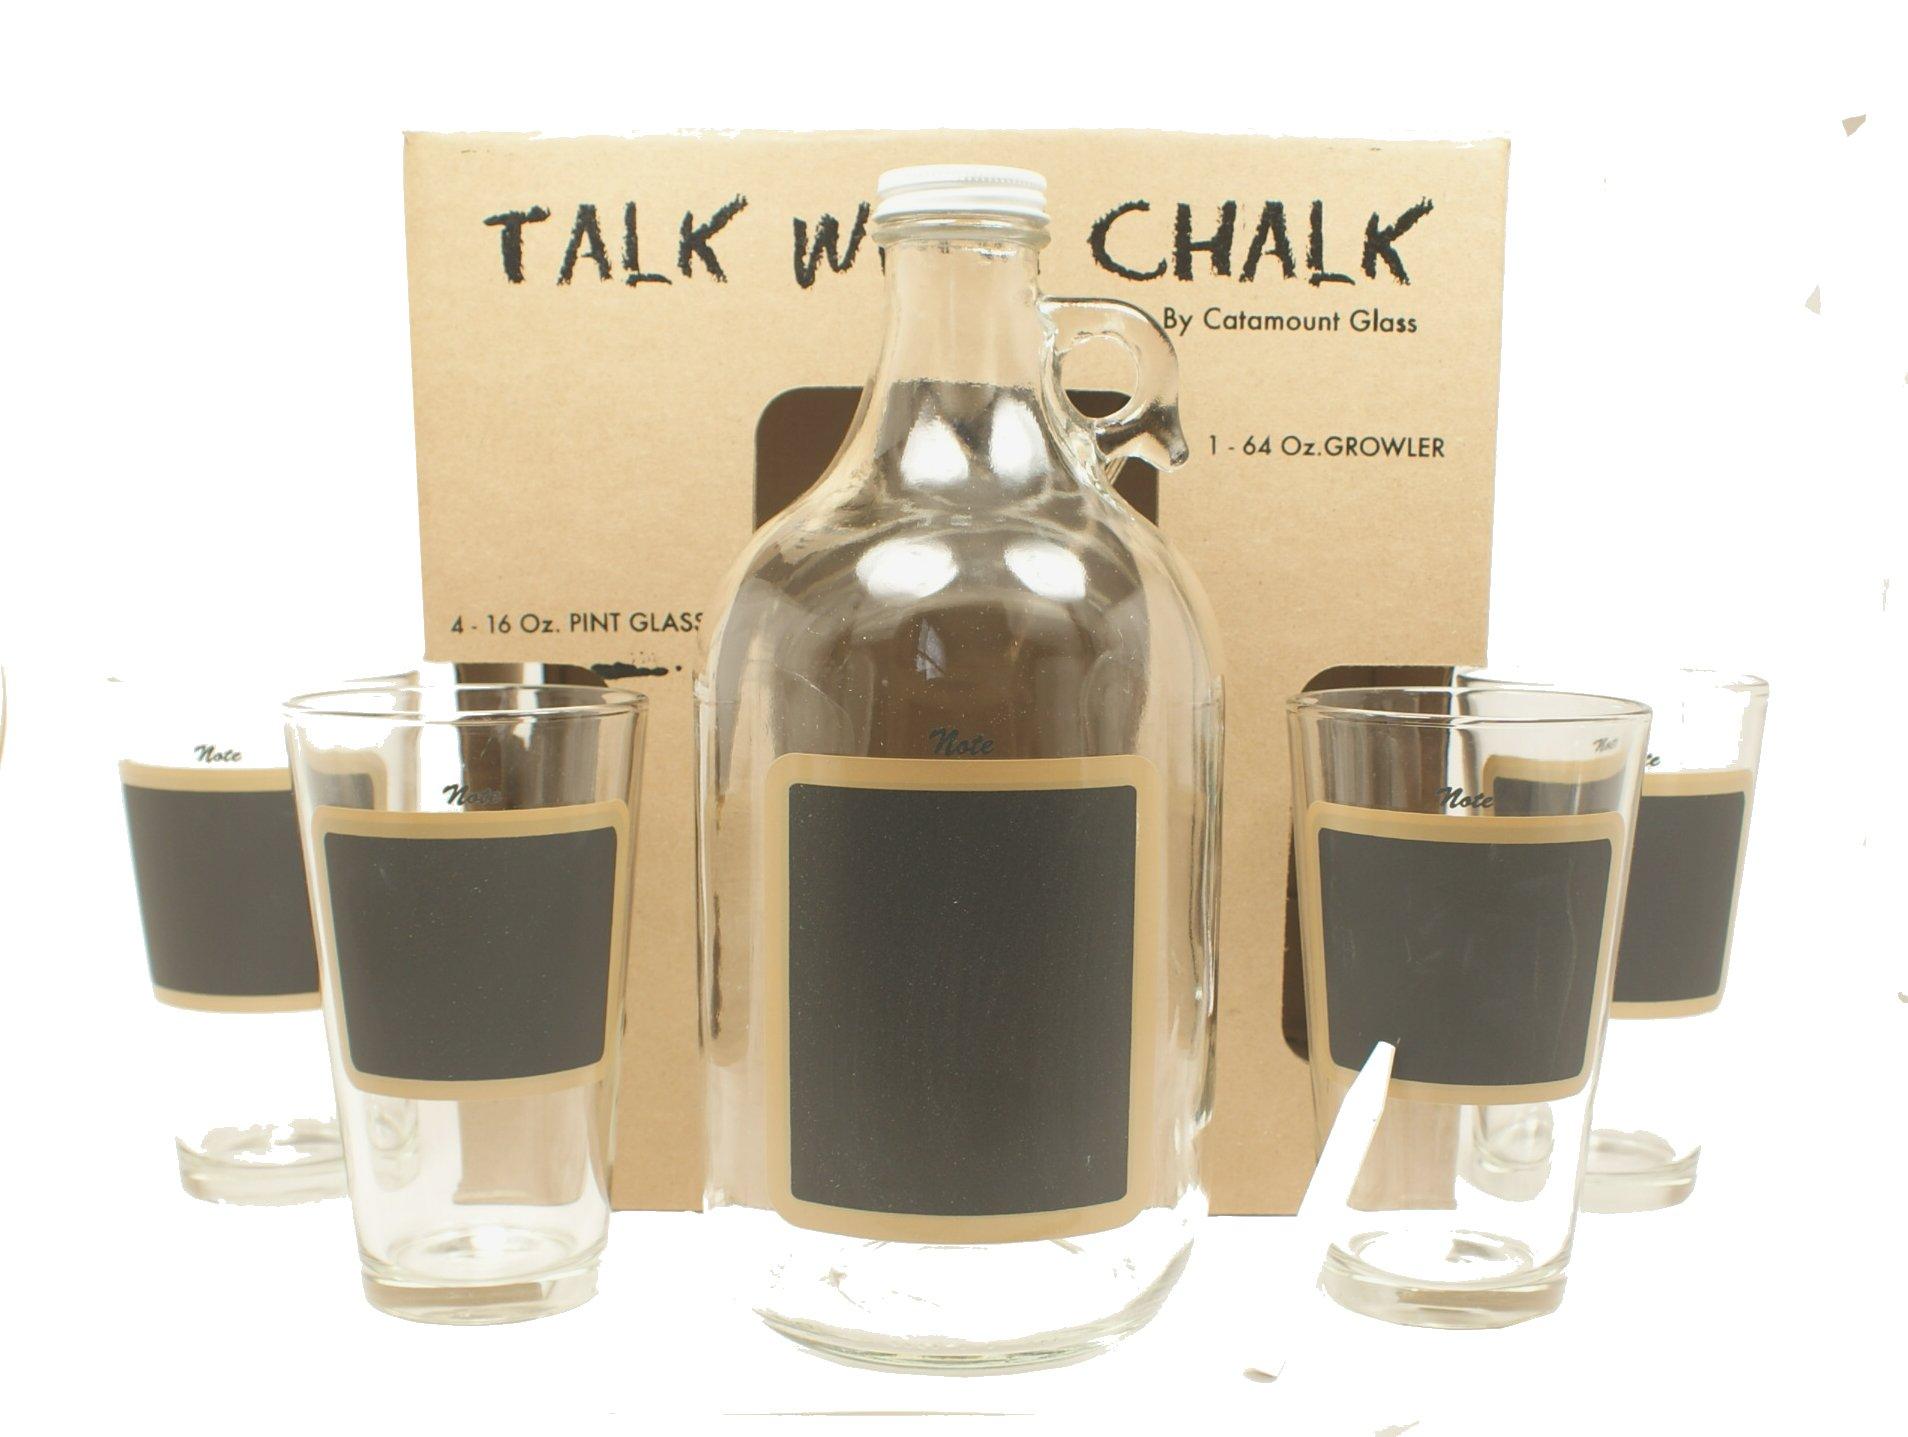 Catamount Glassware 5-Piece ''Talk With Chalk'' Growler Set, Black Chalkboard